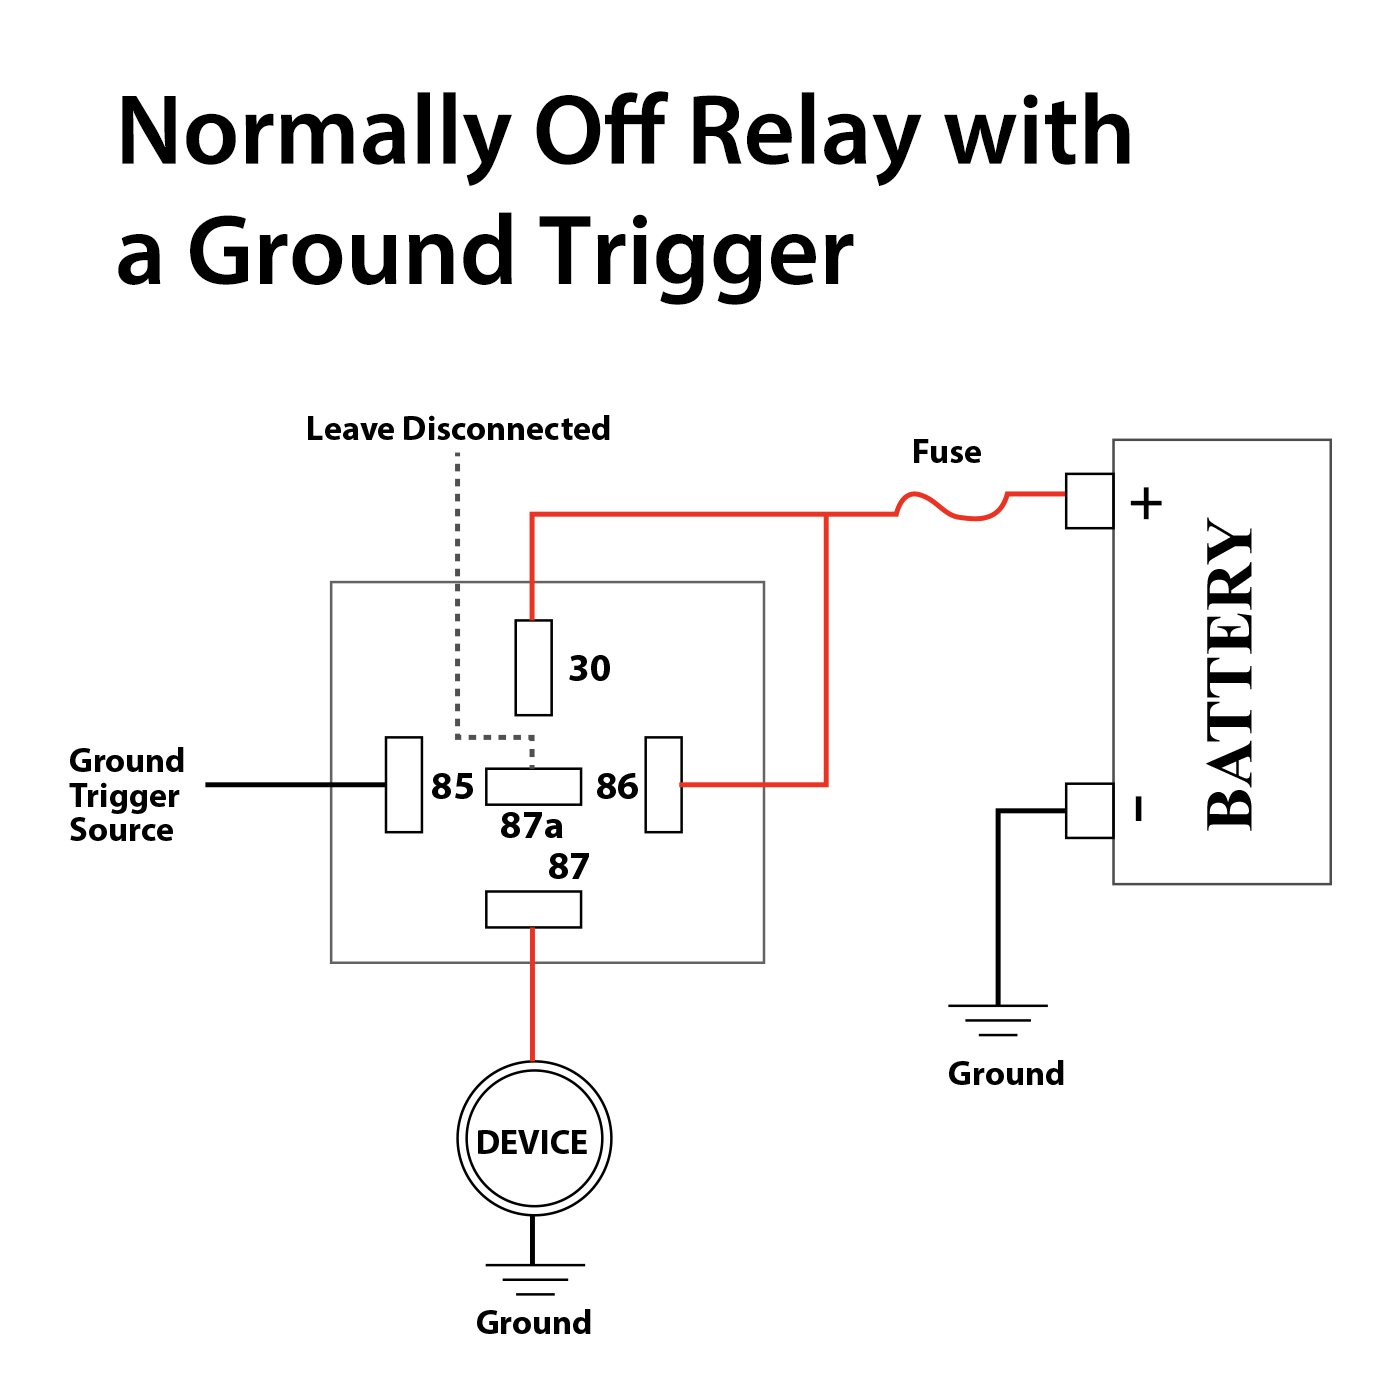 Dc 5 Pin Relay Wiring. 5 Pin 12 Volt Relay, 5 Pin Relay ... Dc Pin Relay Wiring on